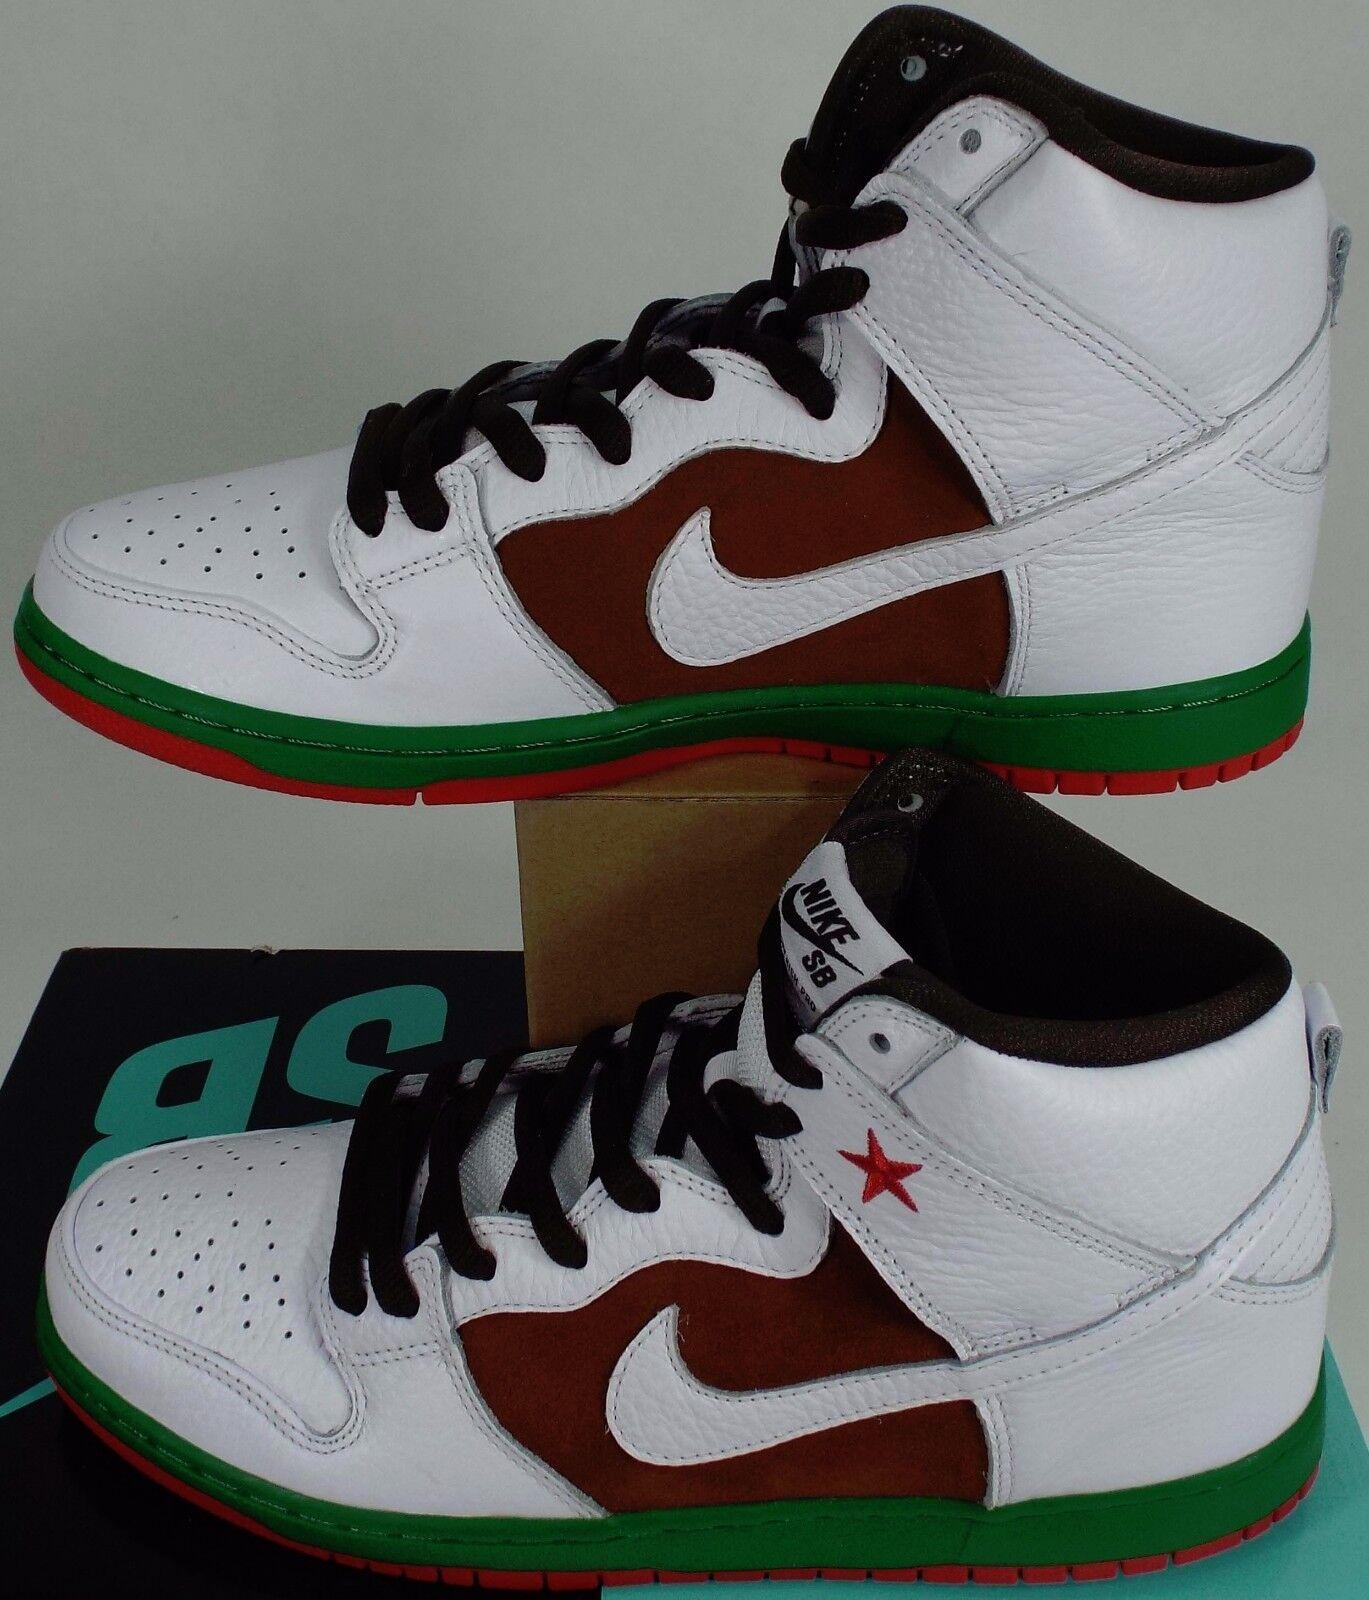 New Mens 10 NIKE Dunk High Premium SB Pecan White Leather Shoes    313171-201